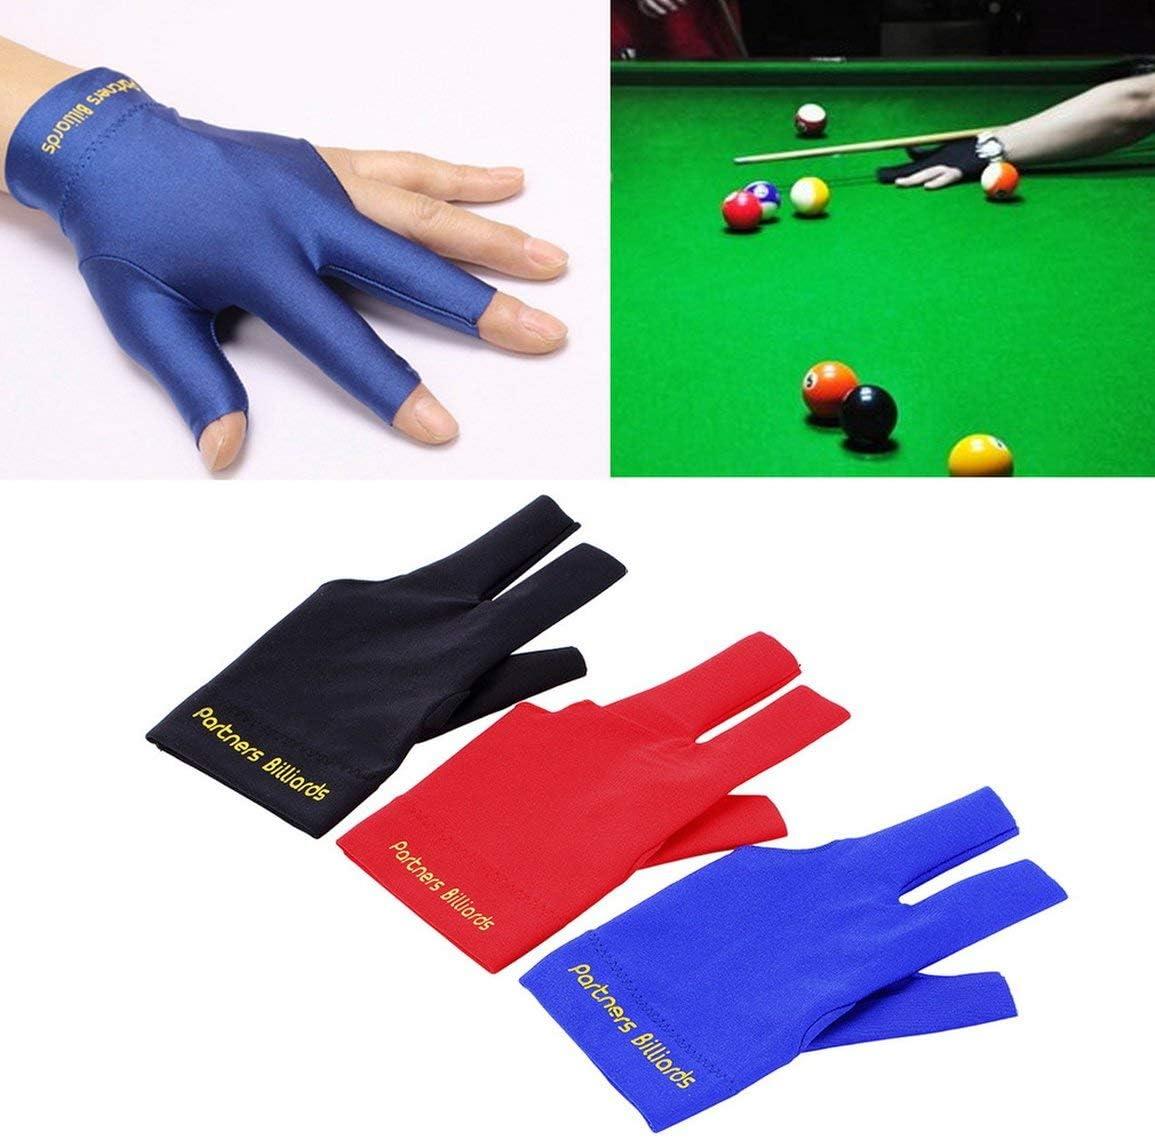 Fantasyworld Professional Sport Comfortable Spandex Snooker Billiard Cue Glove Pool Left Hand Open Three Finger Accessories